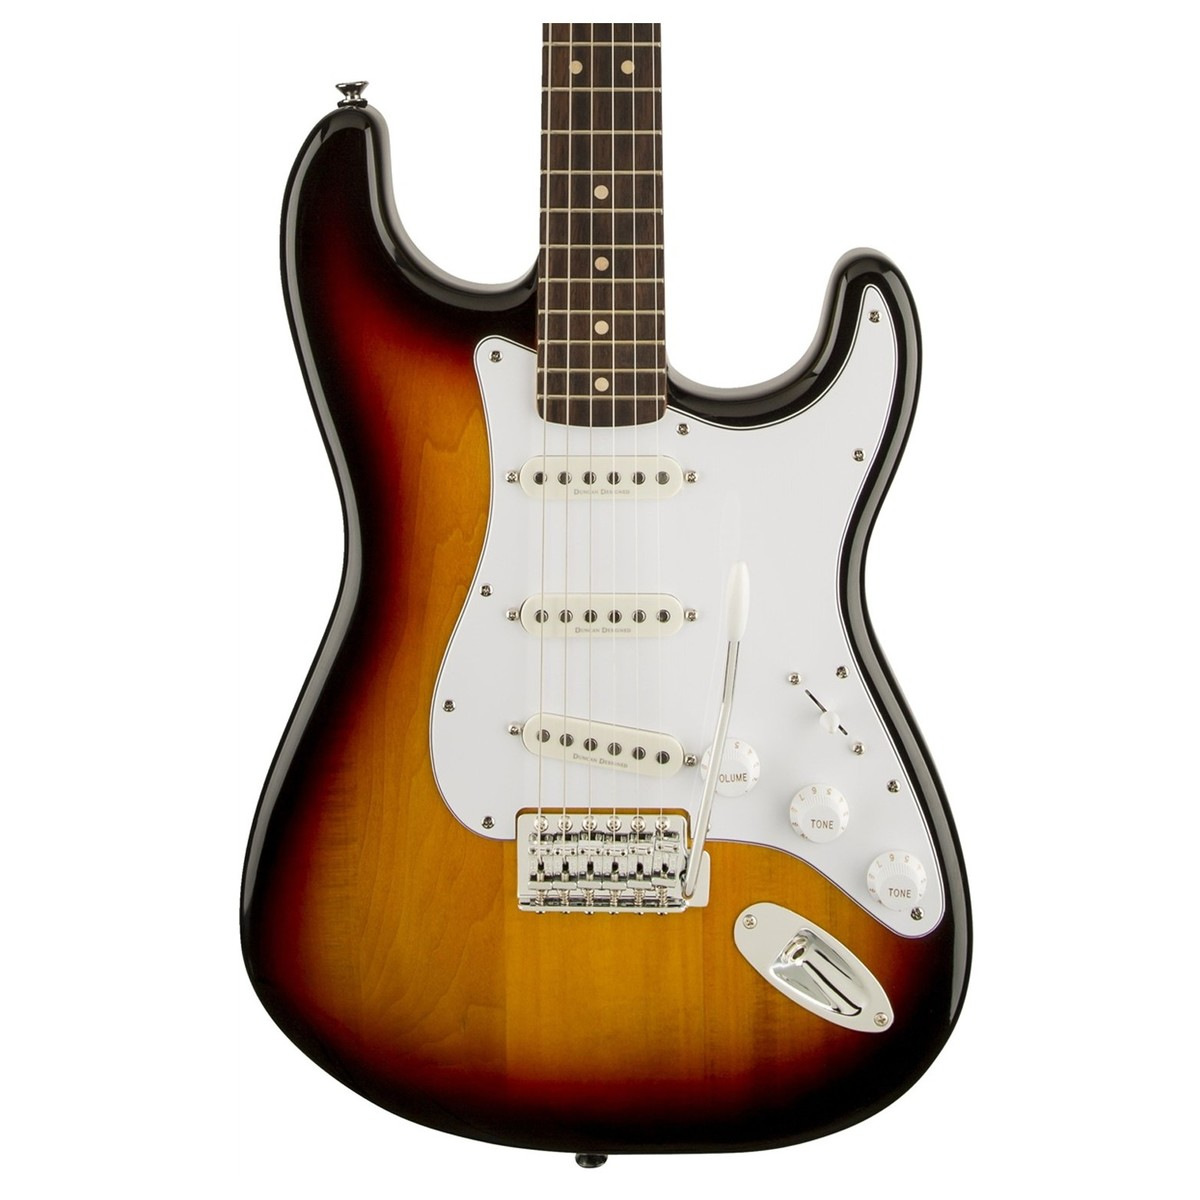 squier vintage modified stratocaster 3 tone sunburst at gear4music. Black Bedroom Furniture Sets. Home Design Ideas